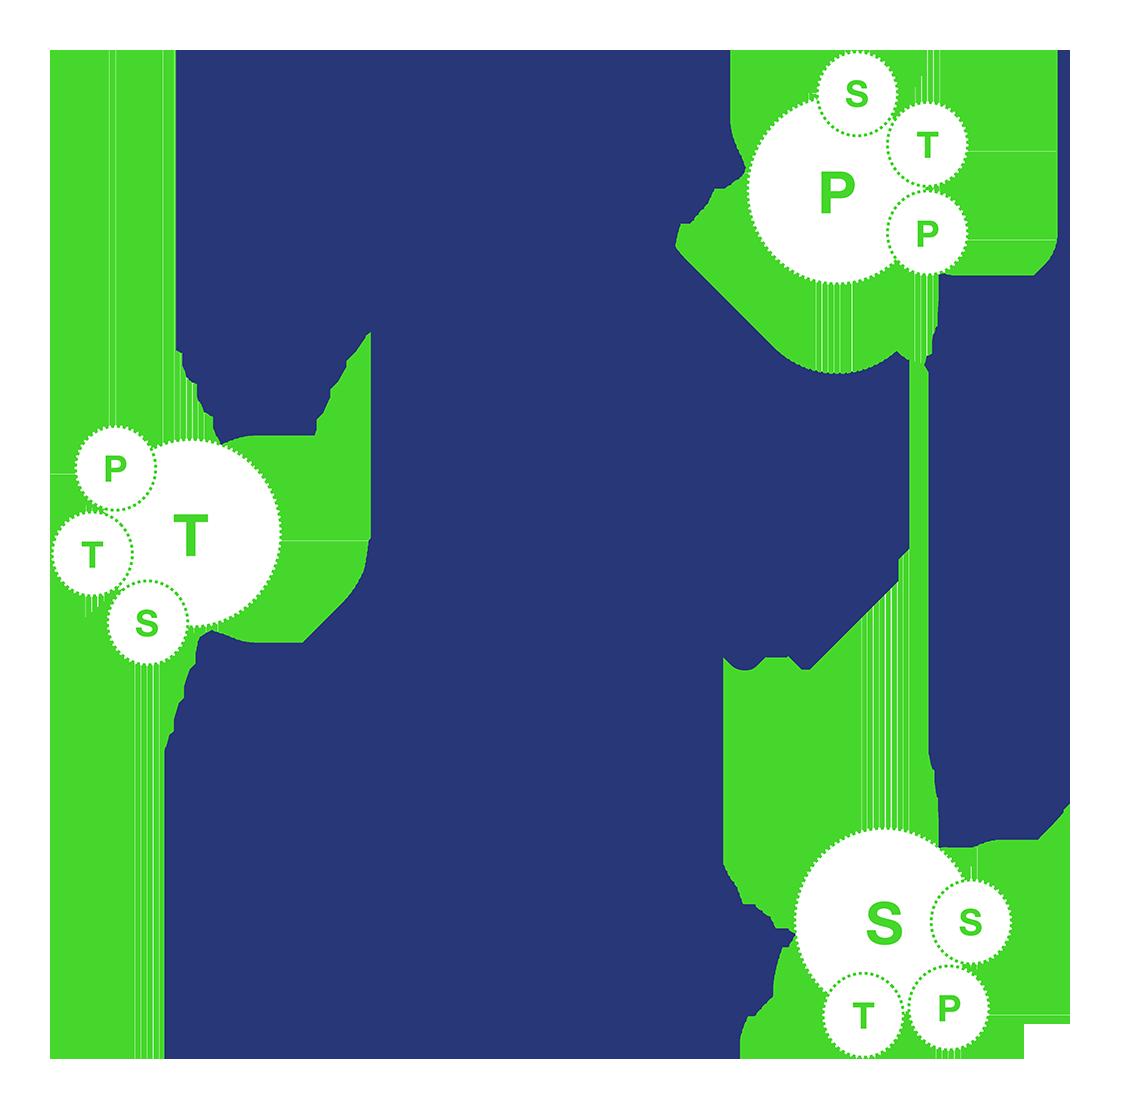 MatricePST.png